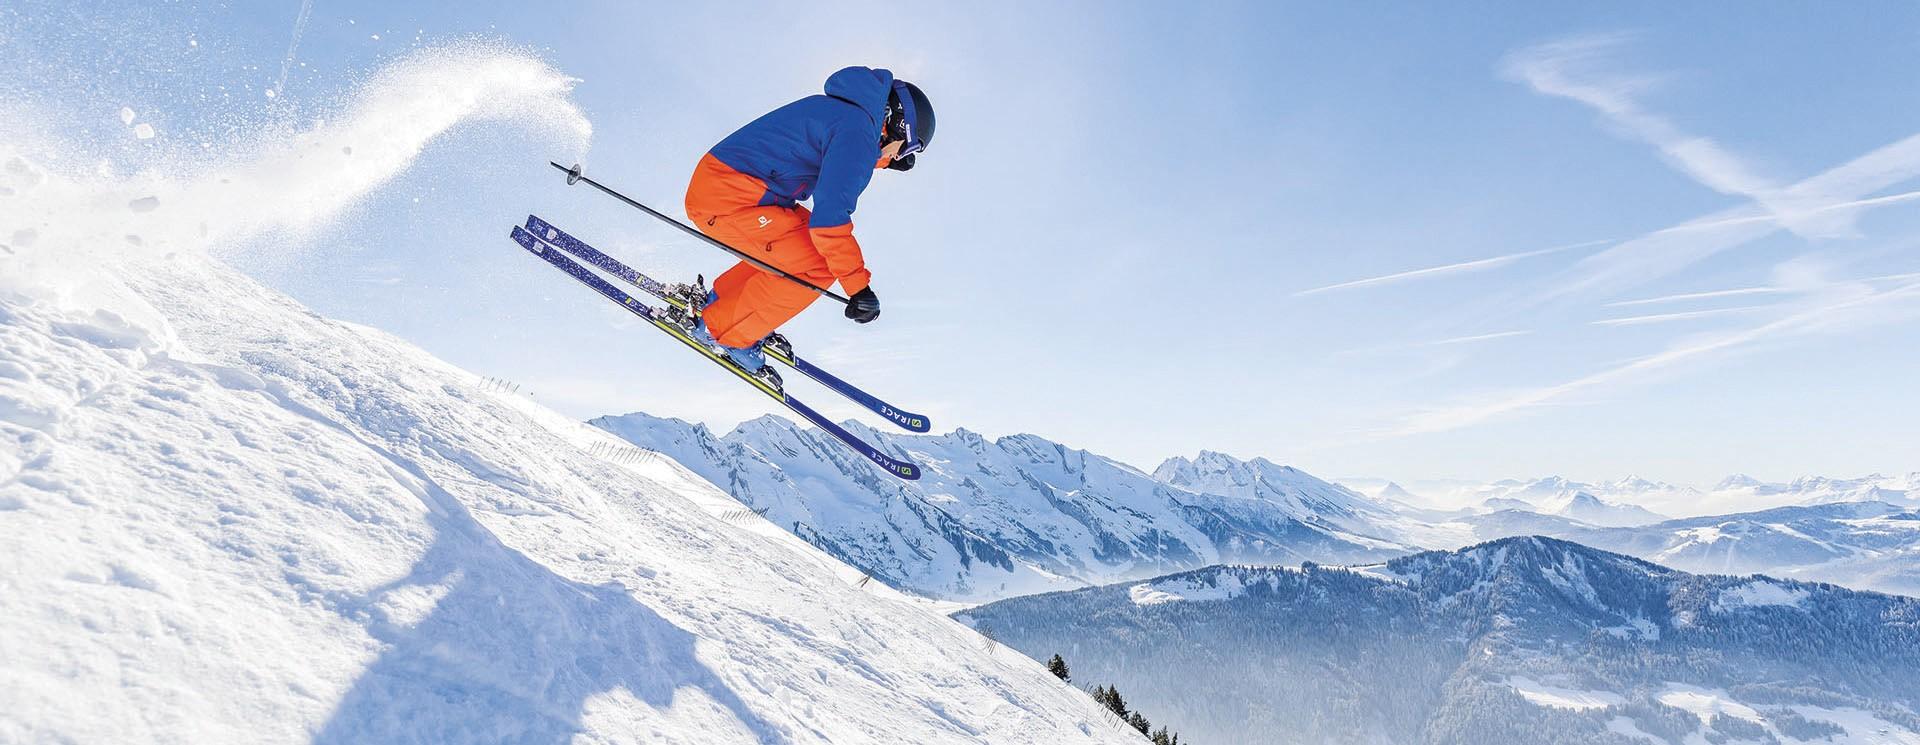 ski-h2019-ot-le-grand-bornand-alpcat-medias-34i8260-web-1920x745-2198